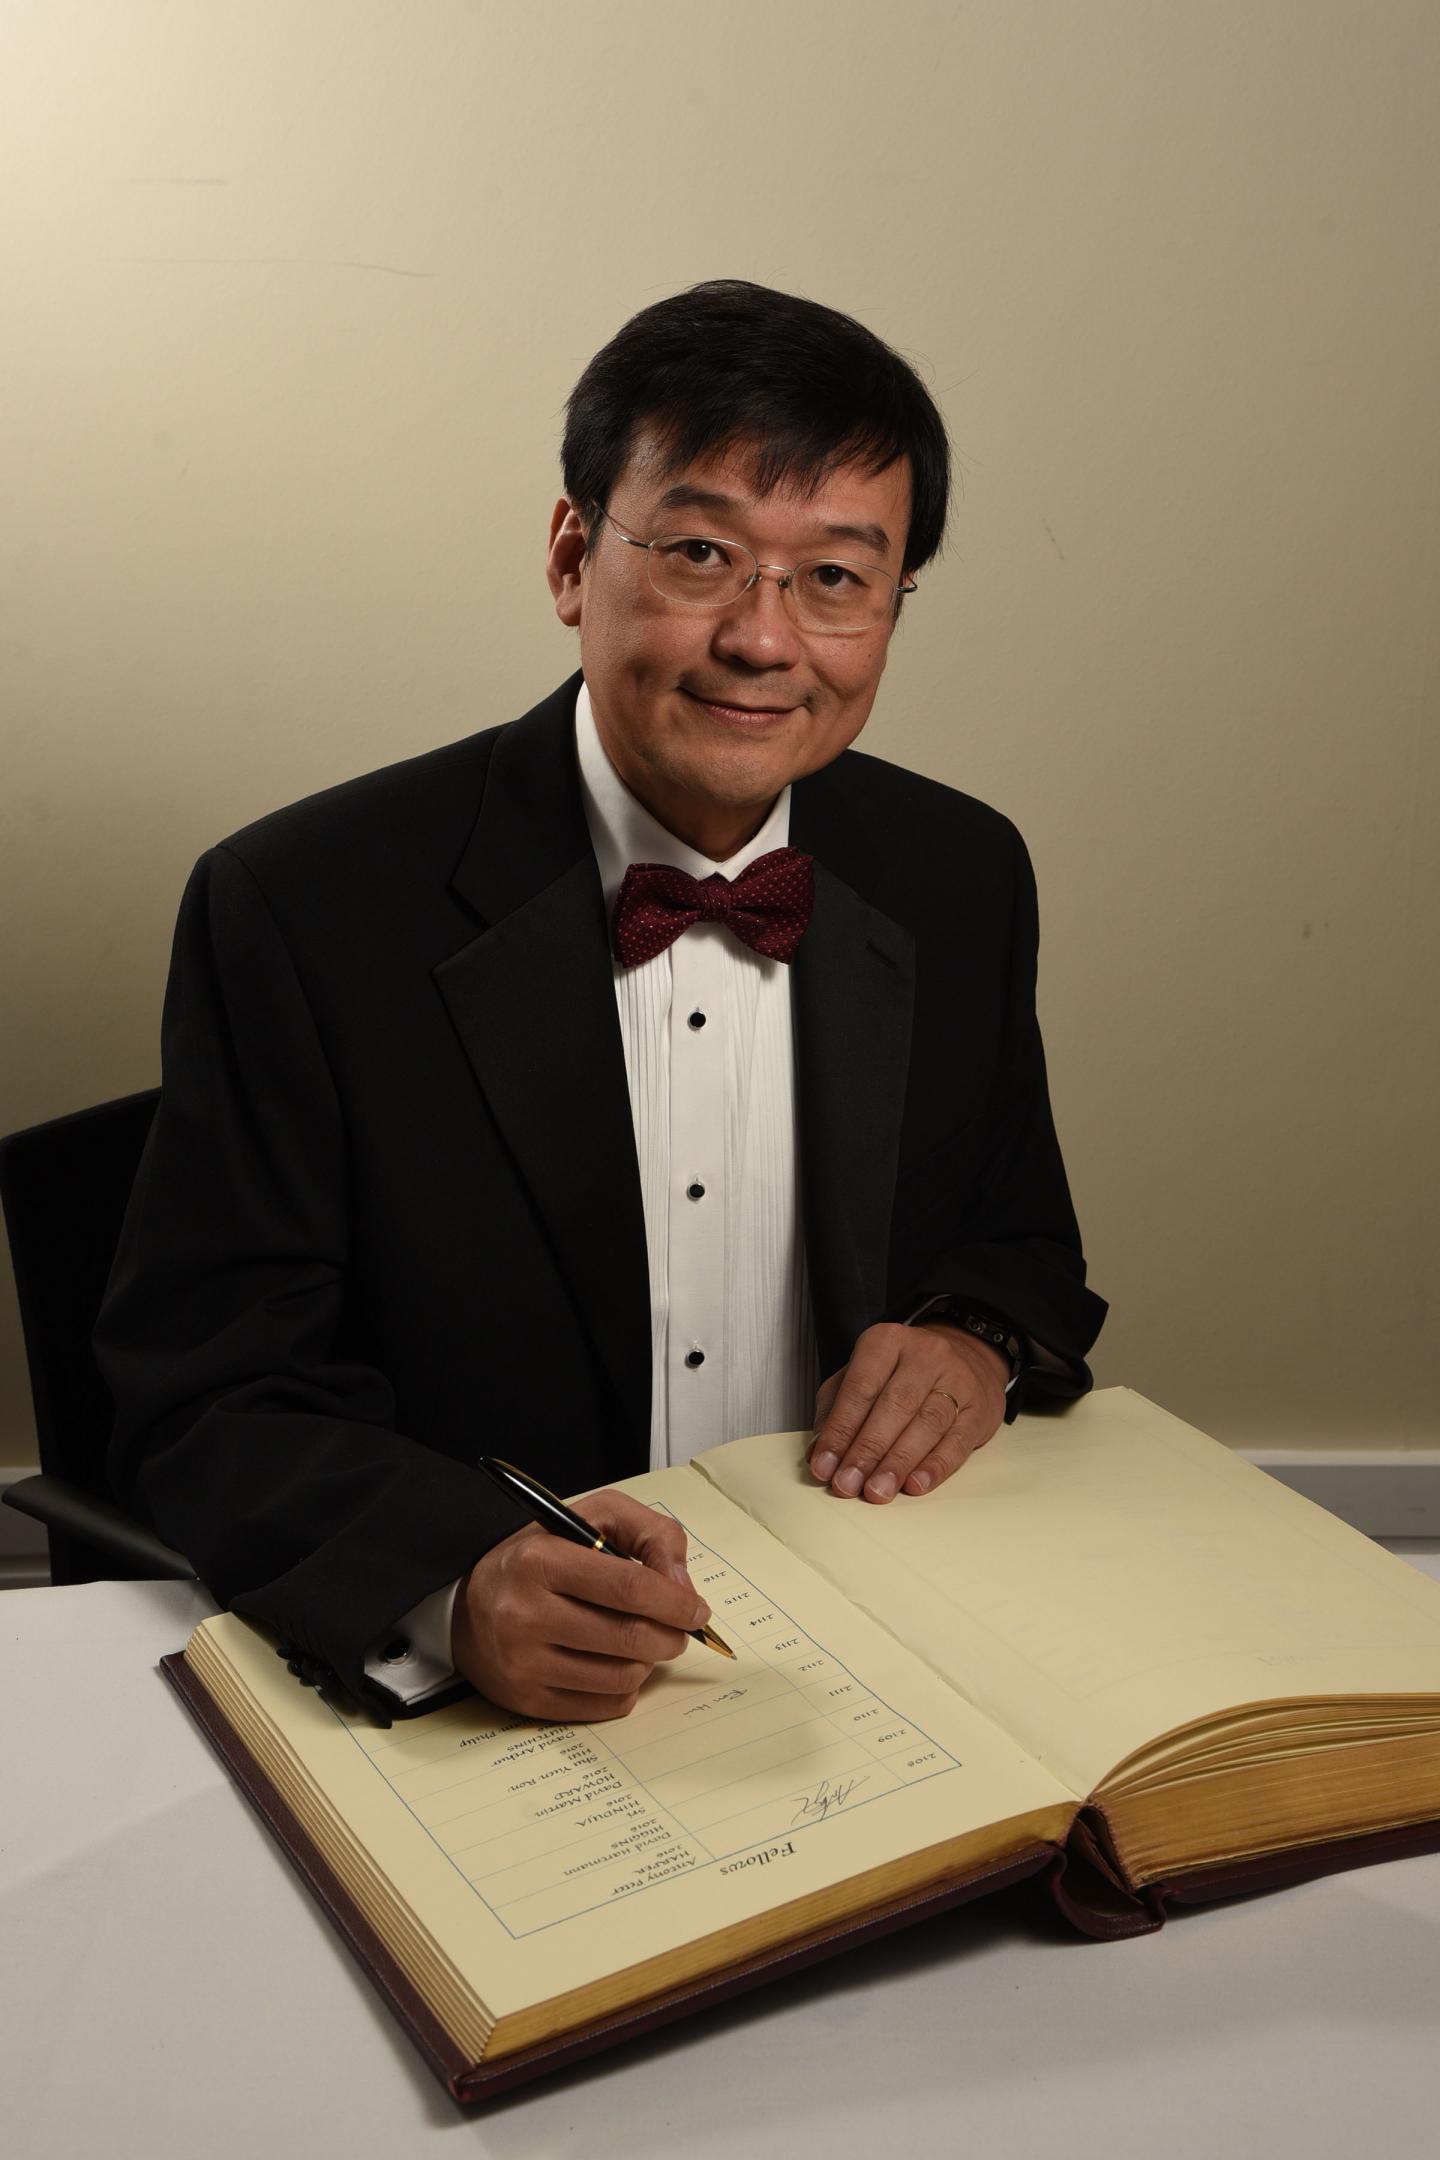 Ron Hui, University of Hong Kong